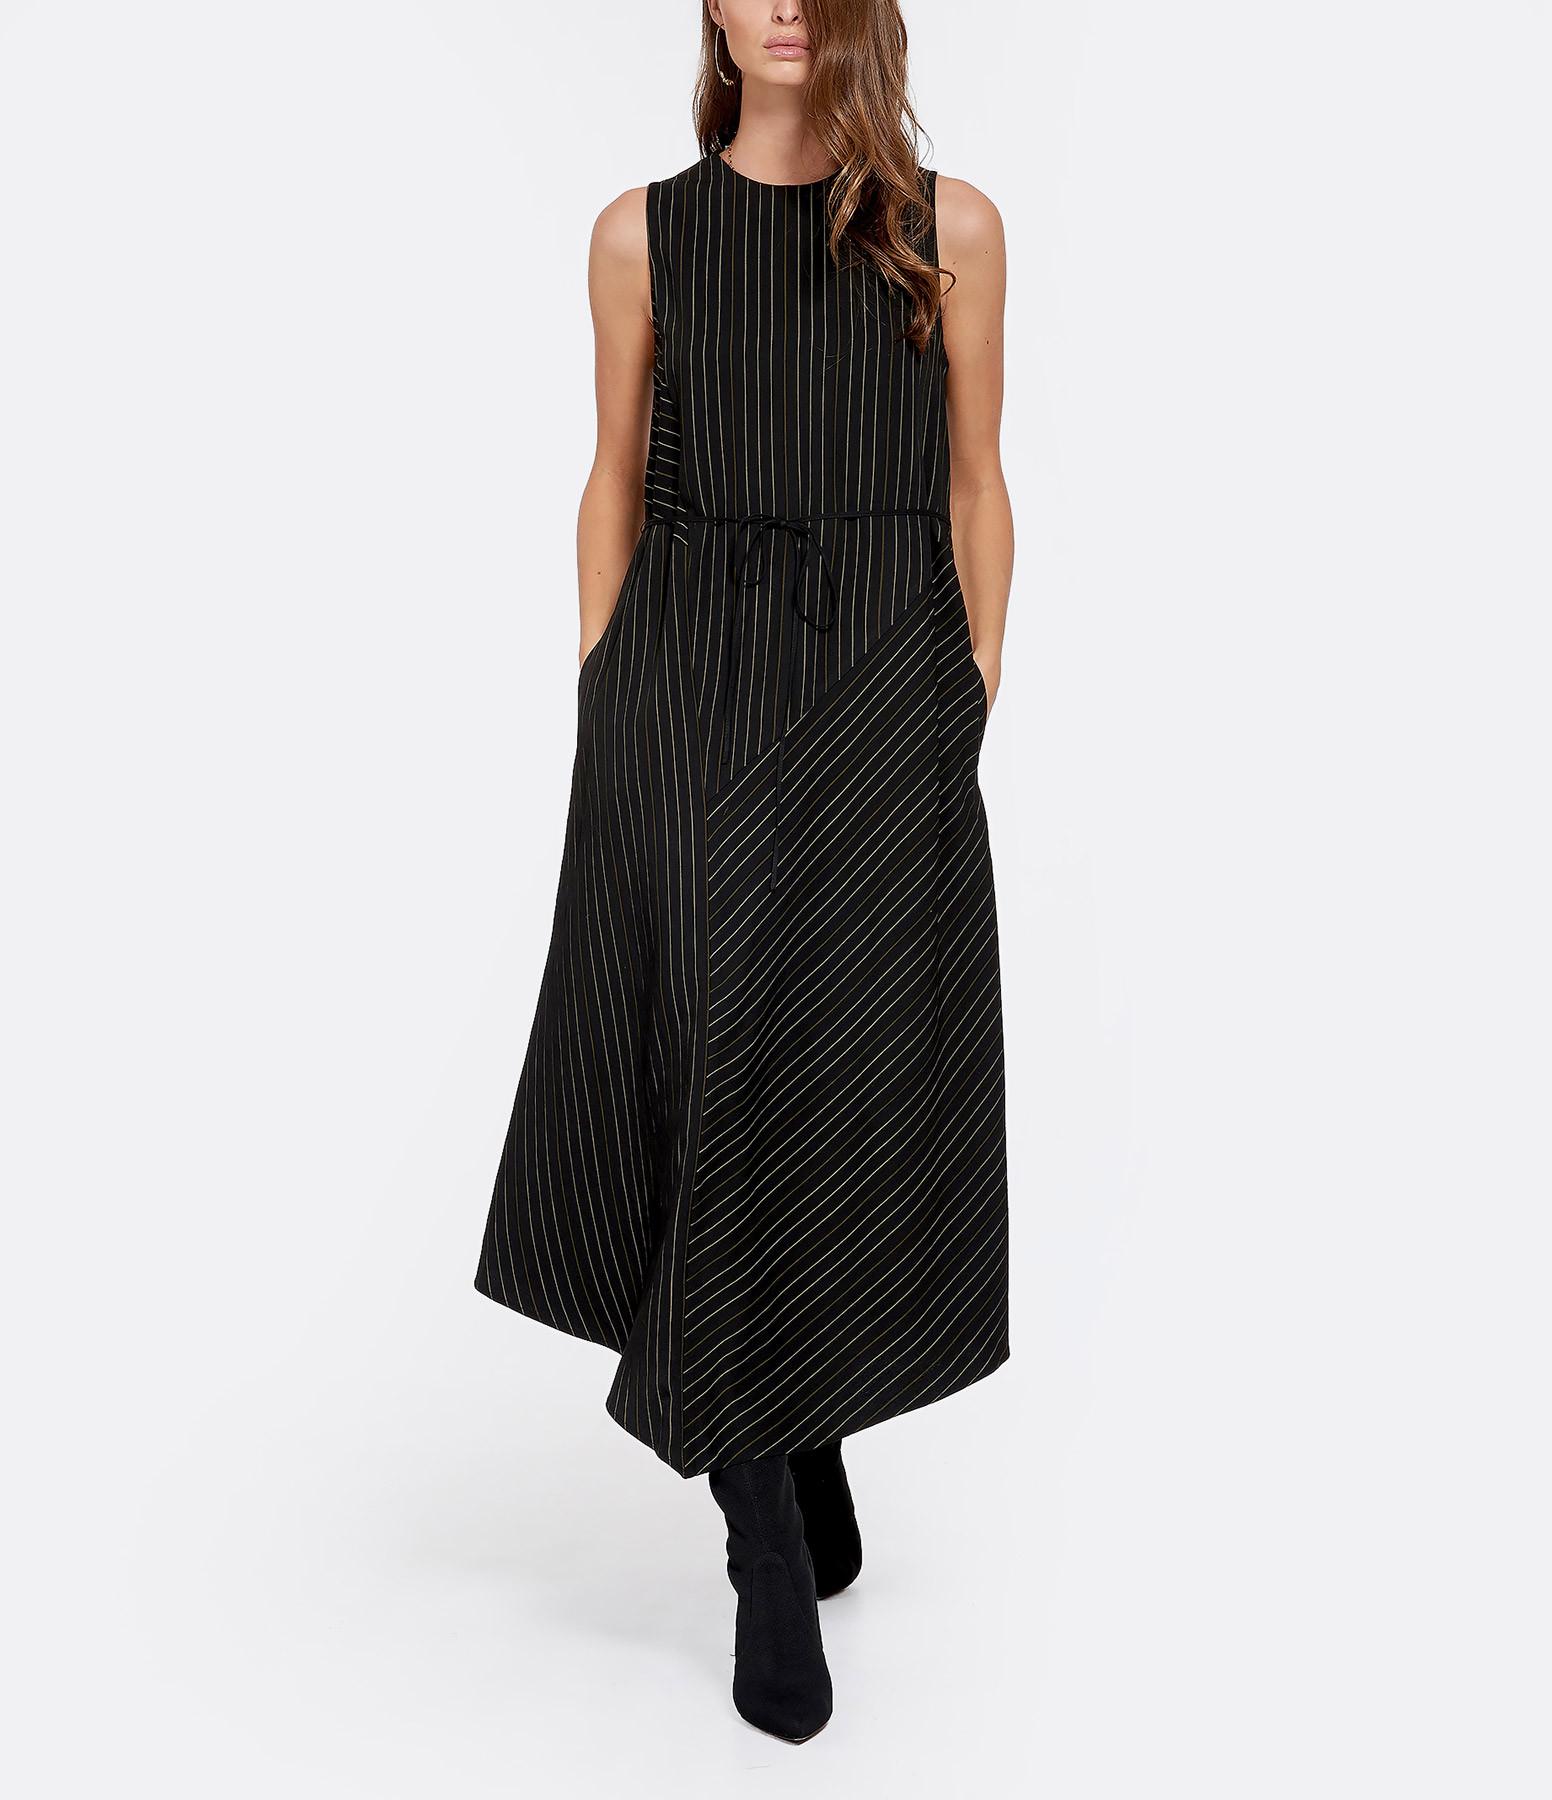 VINCE - Robe Rayures Noir